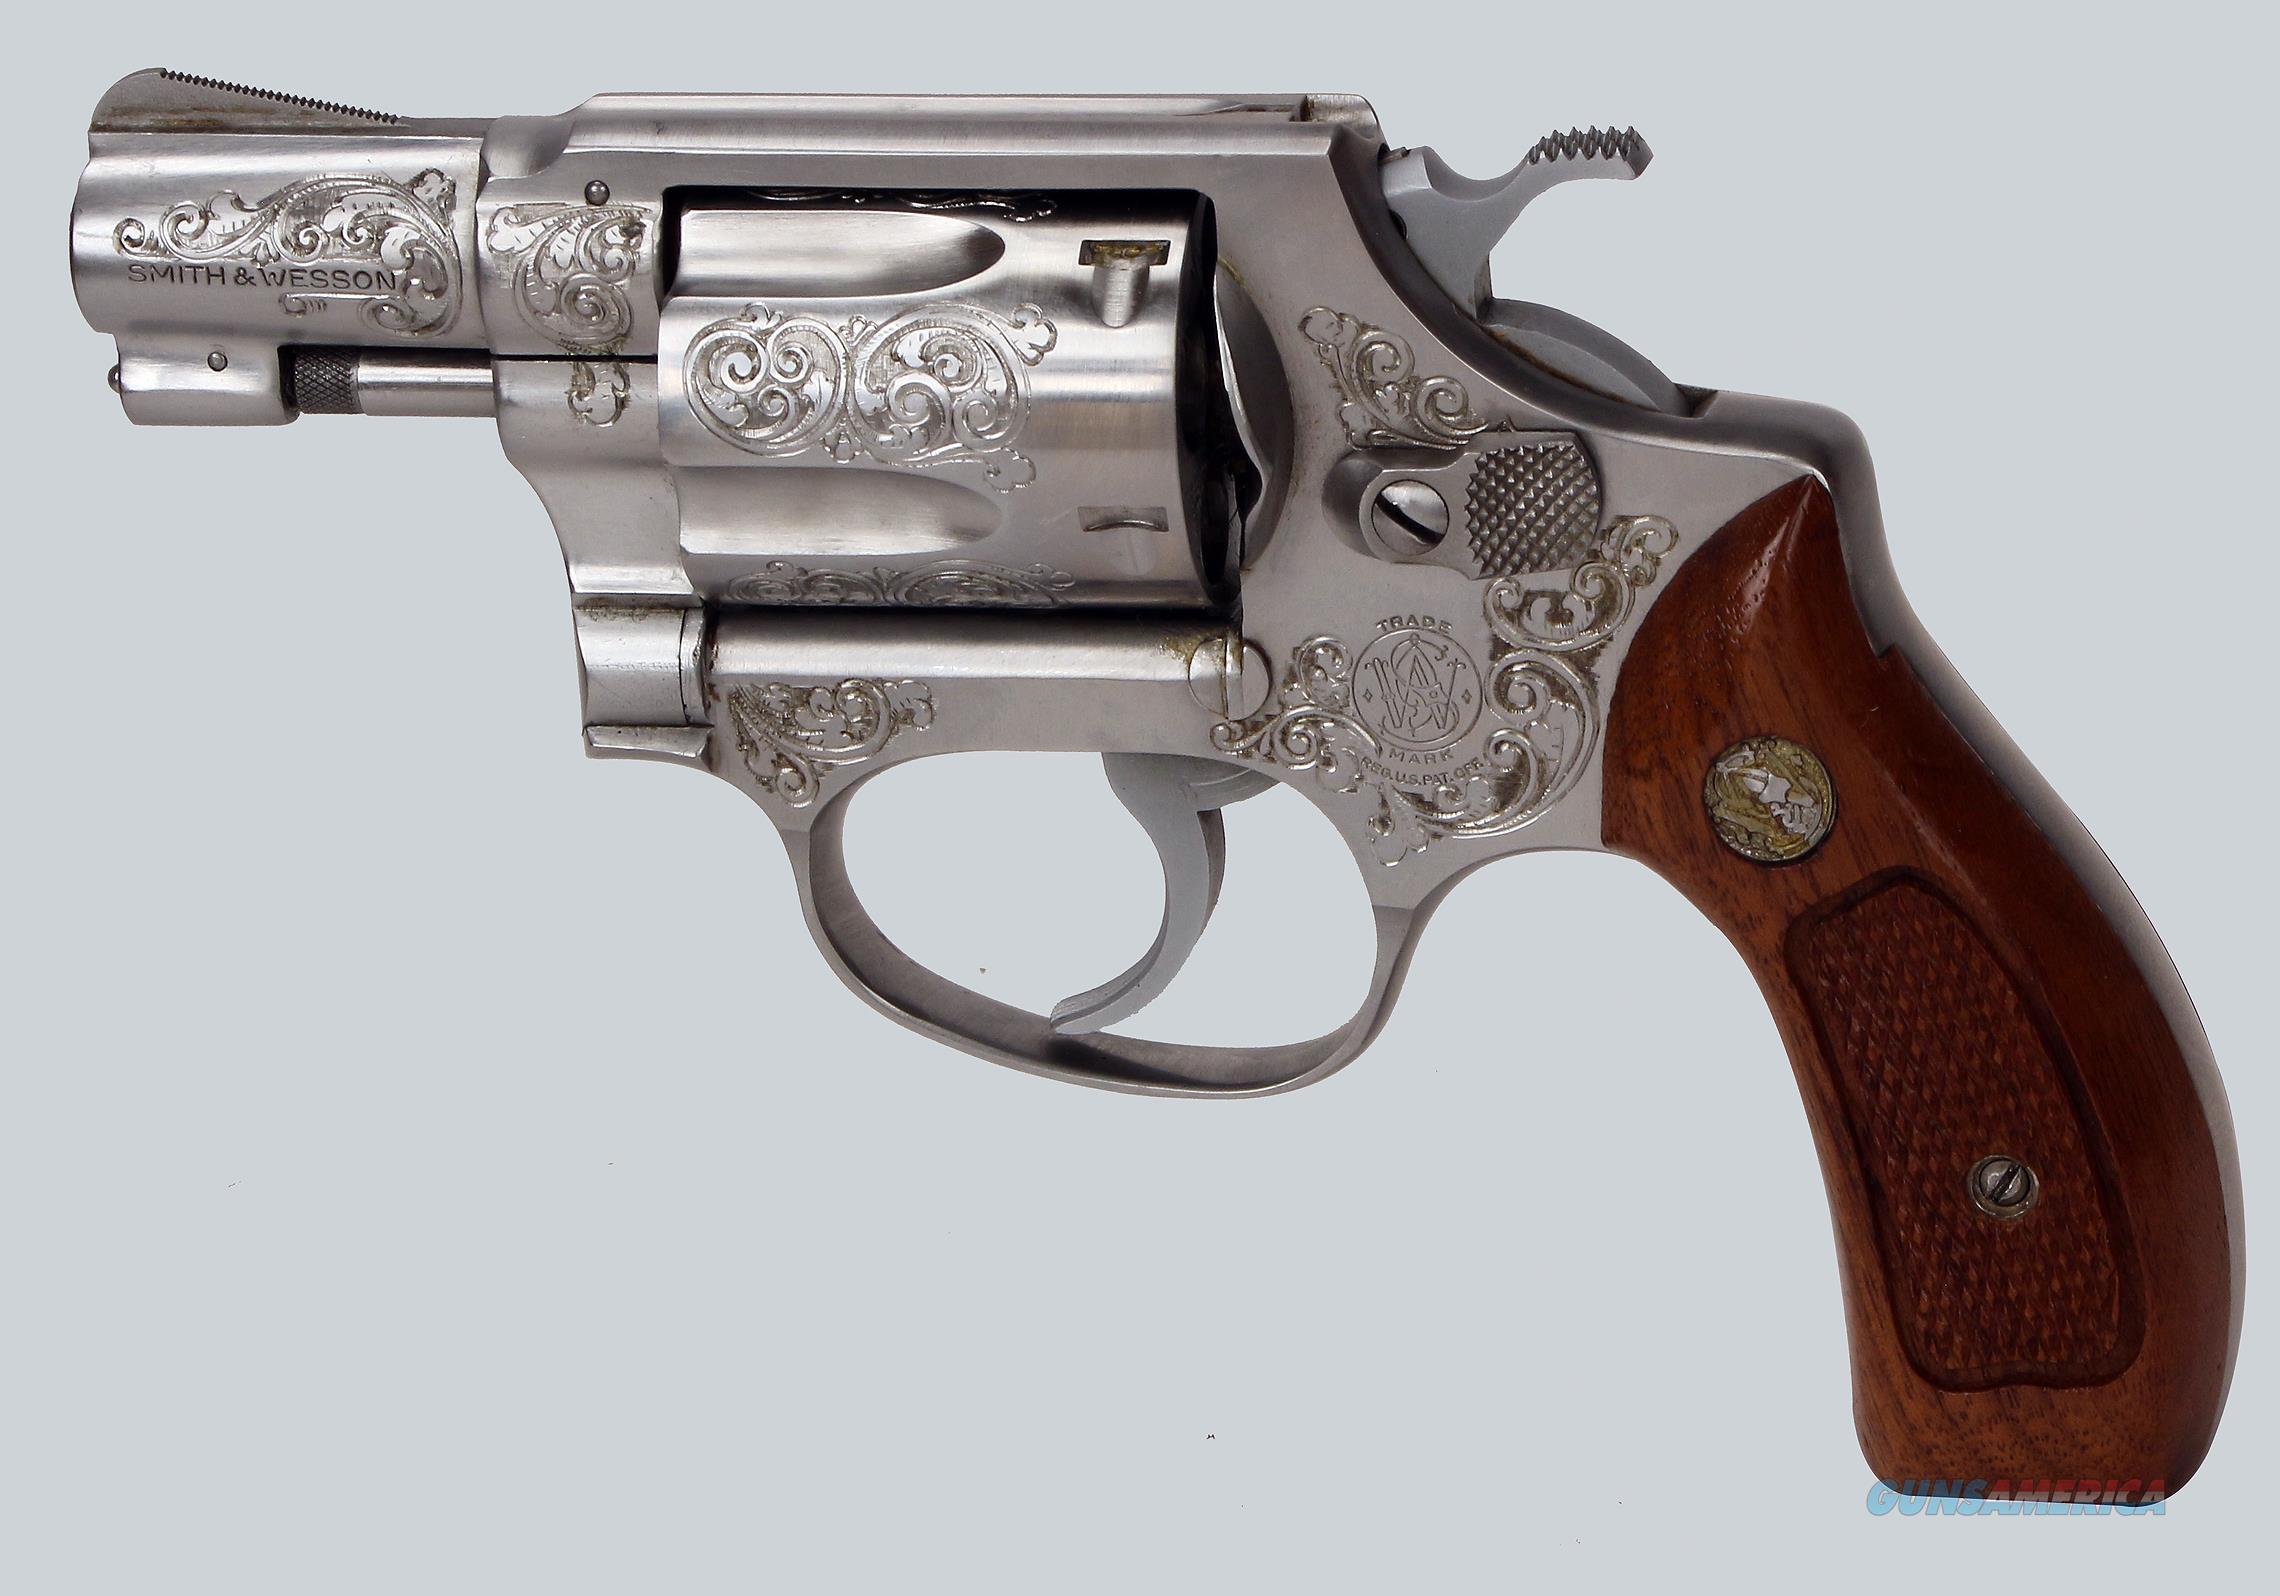 Smith & Wesson 38spl Model 60 Revolver  Guns > Pistols > Smith & Wesson Revolvers > Small Frame ( J )